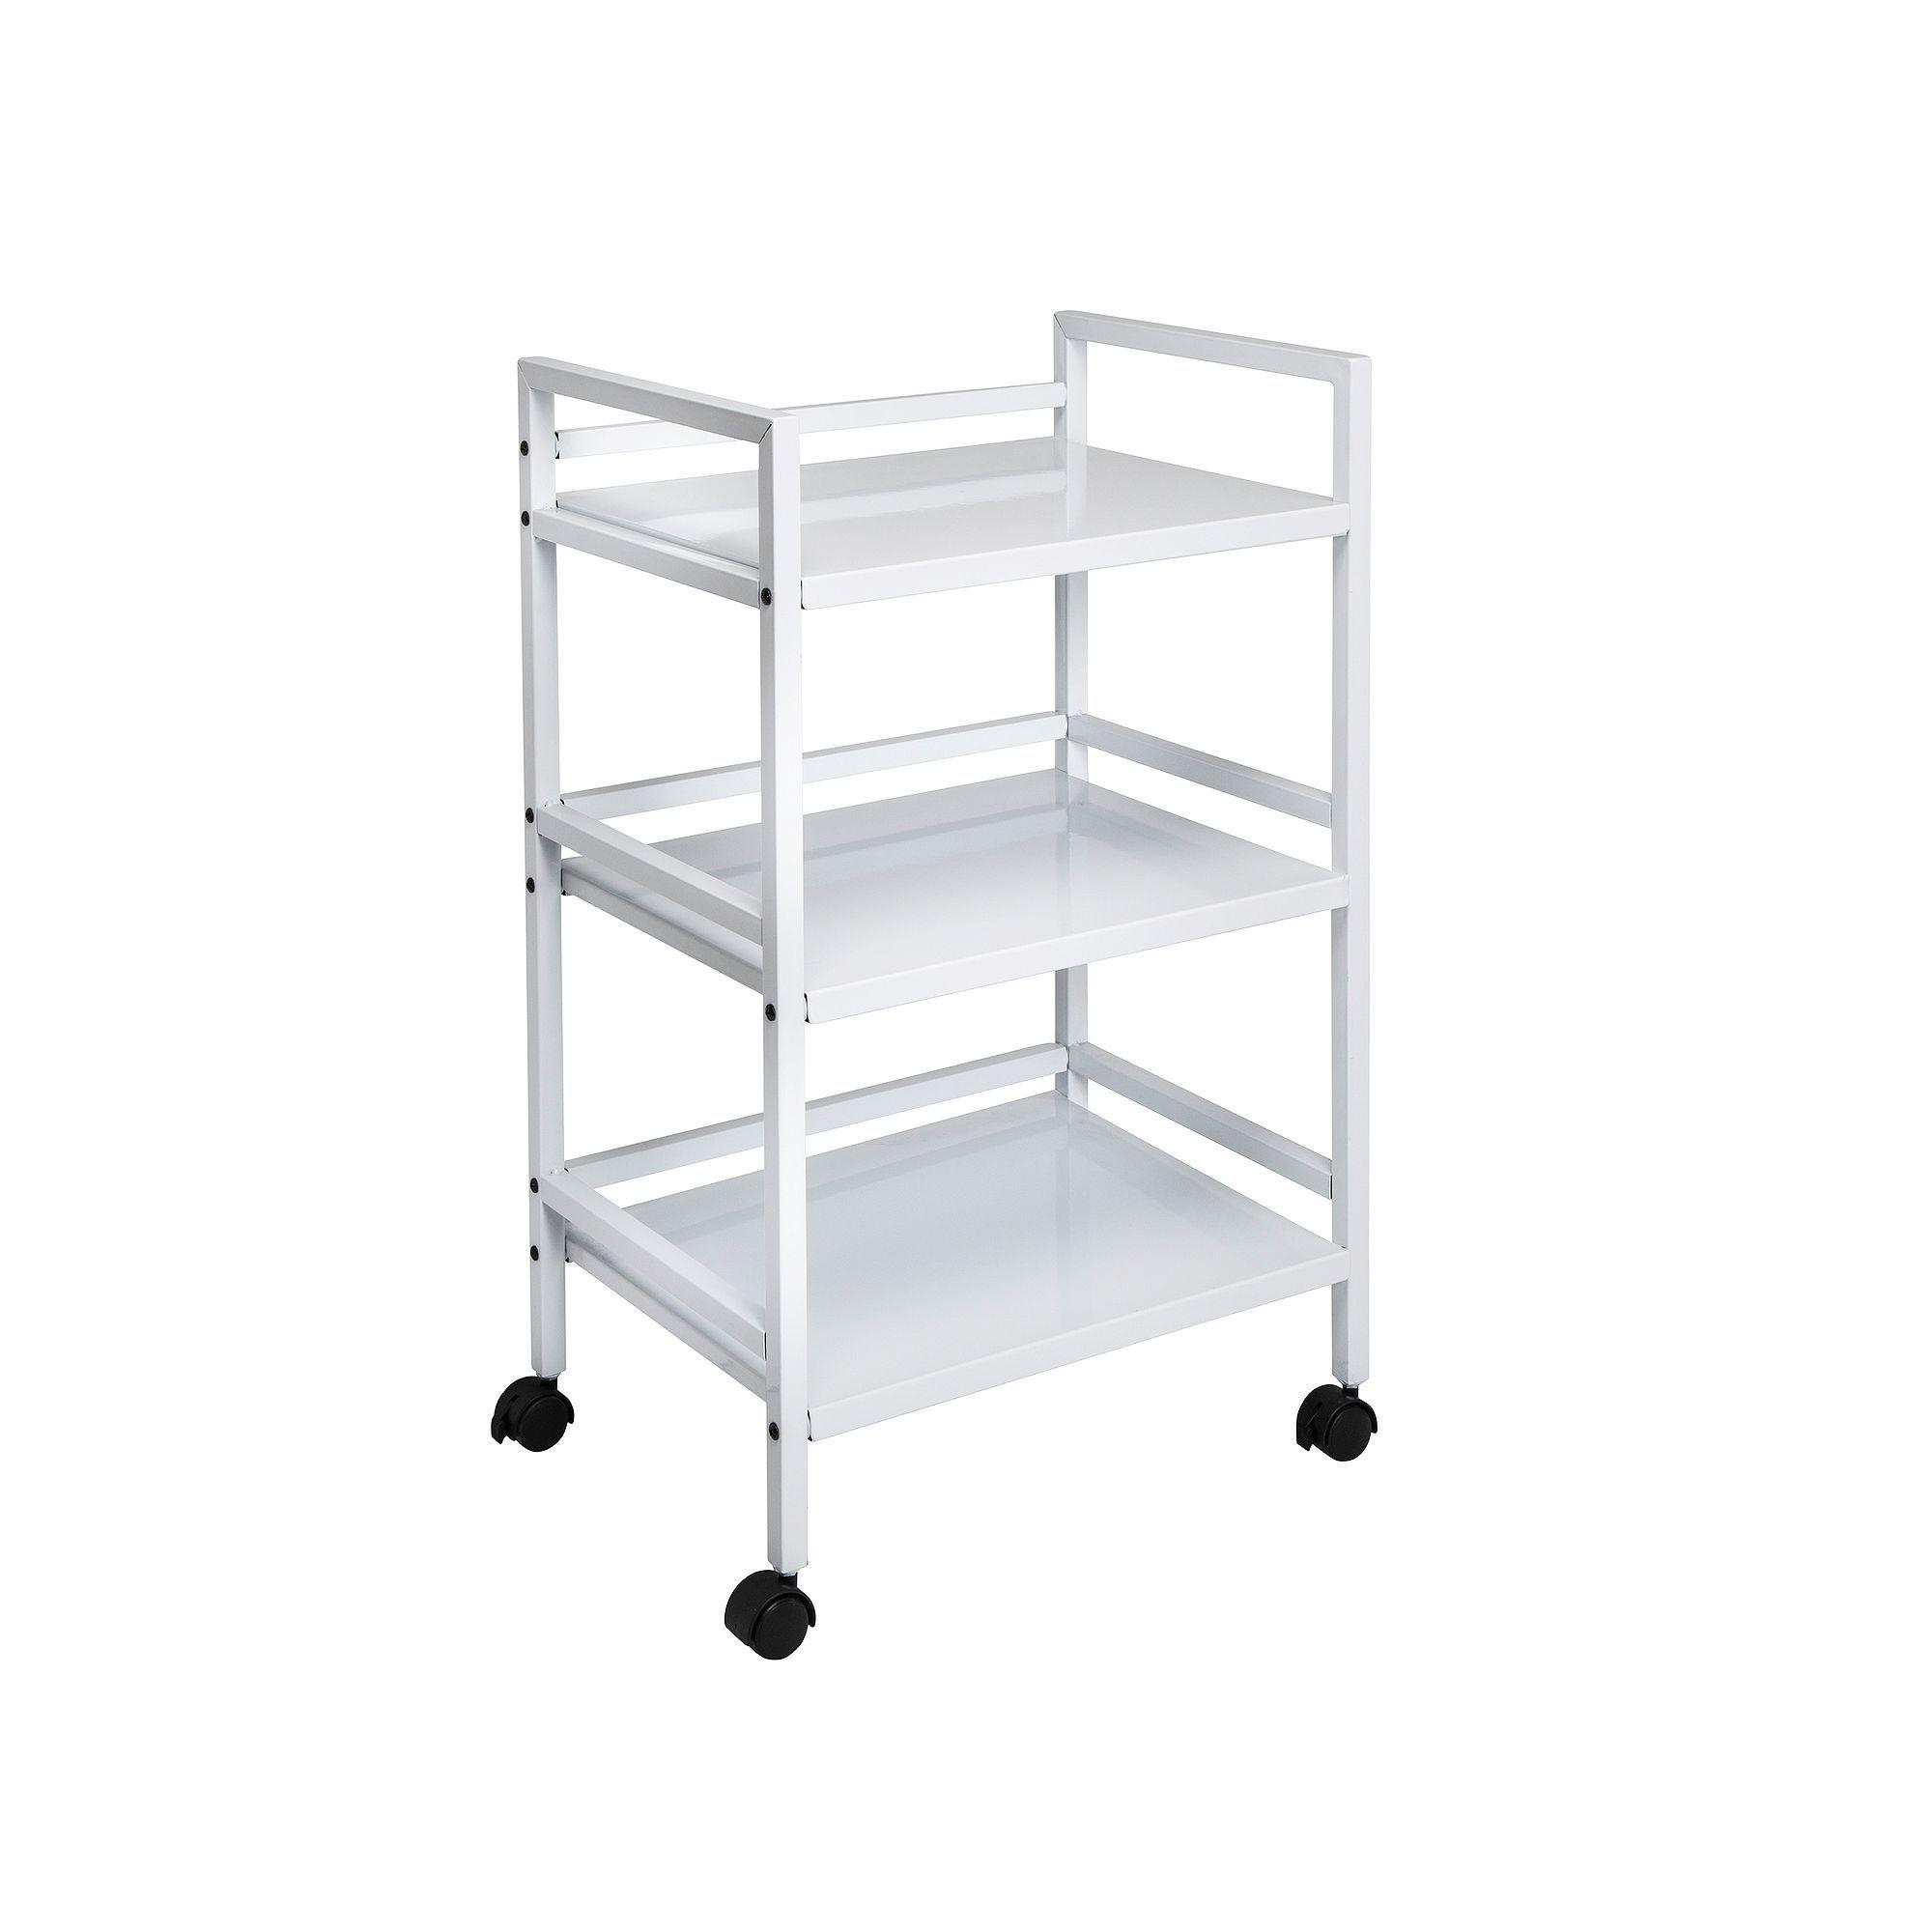 Honey Can Do 3 Tier Rolling Cart Rolling Utility Cart Shelves